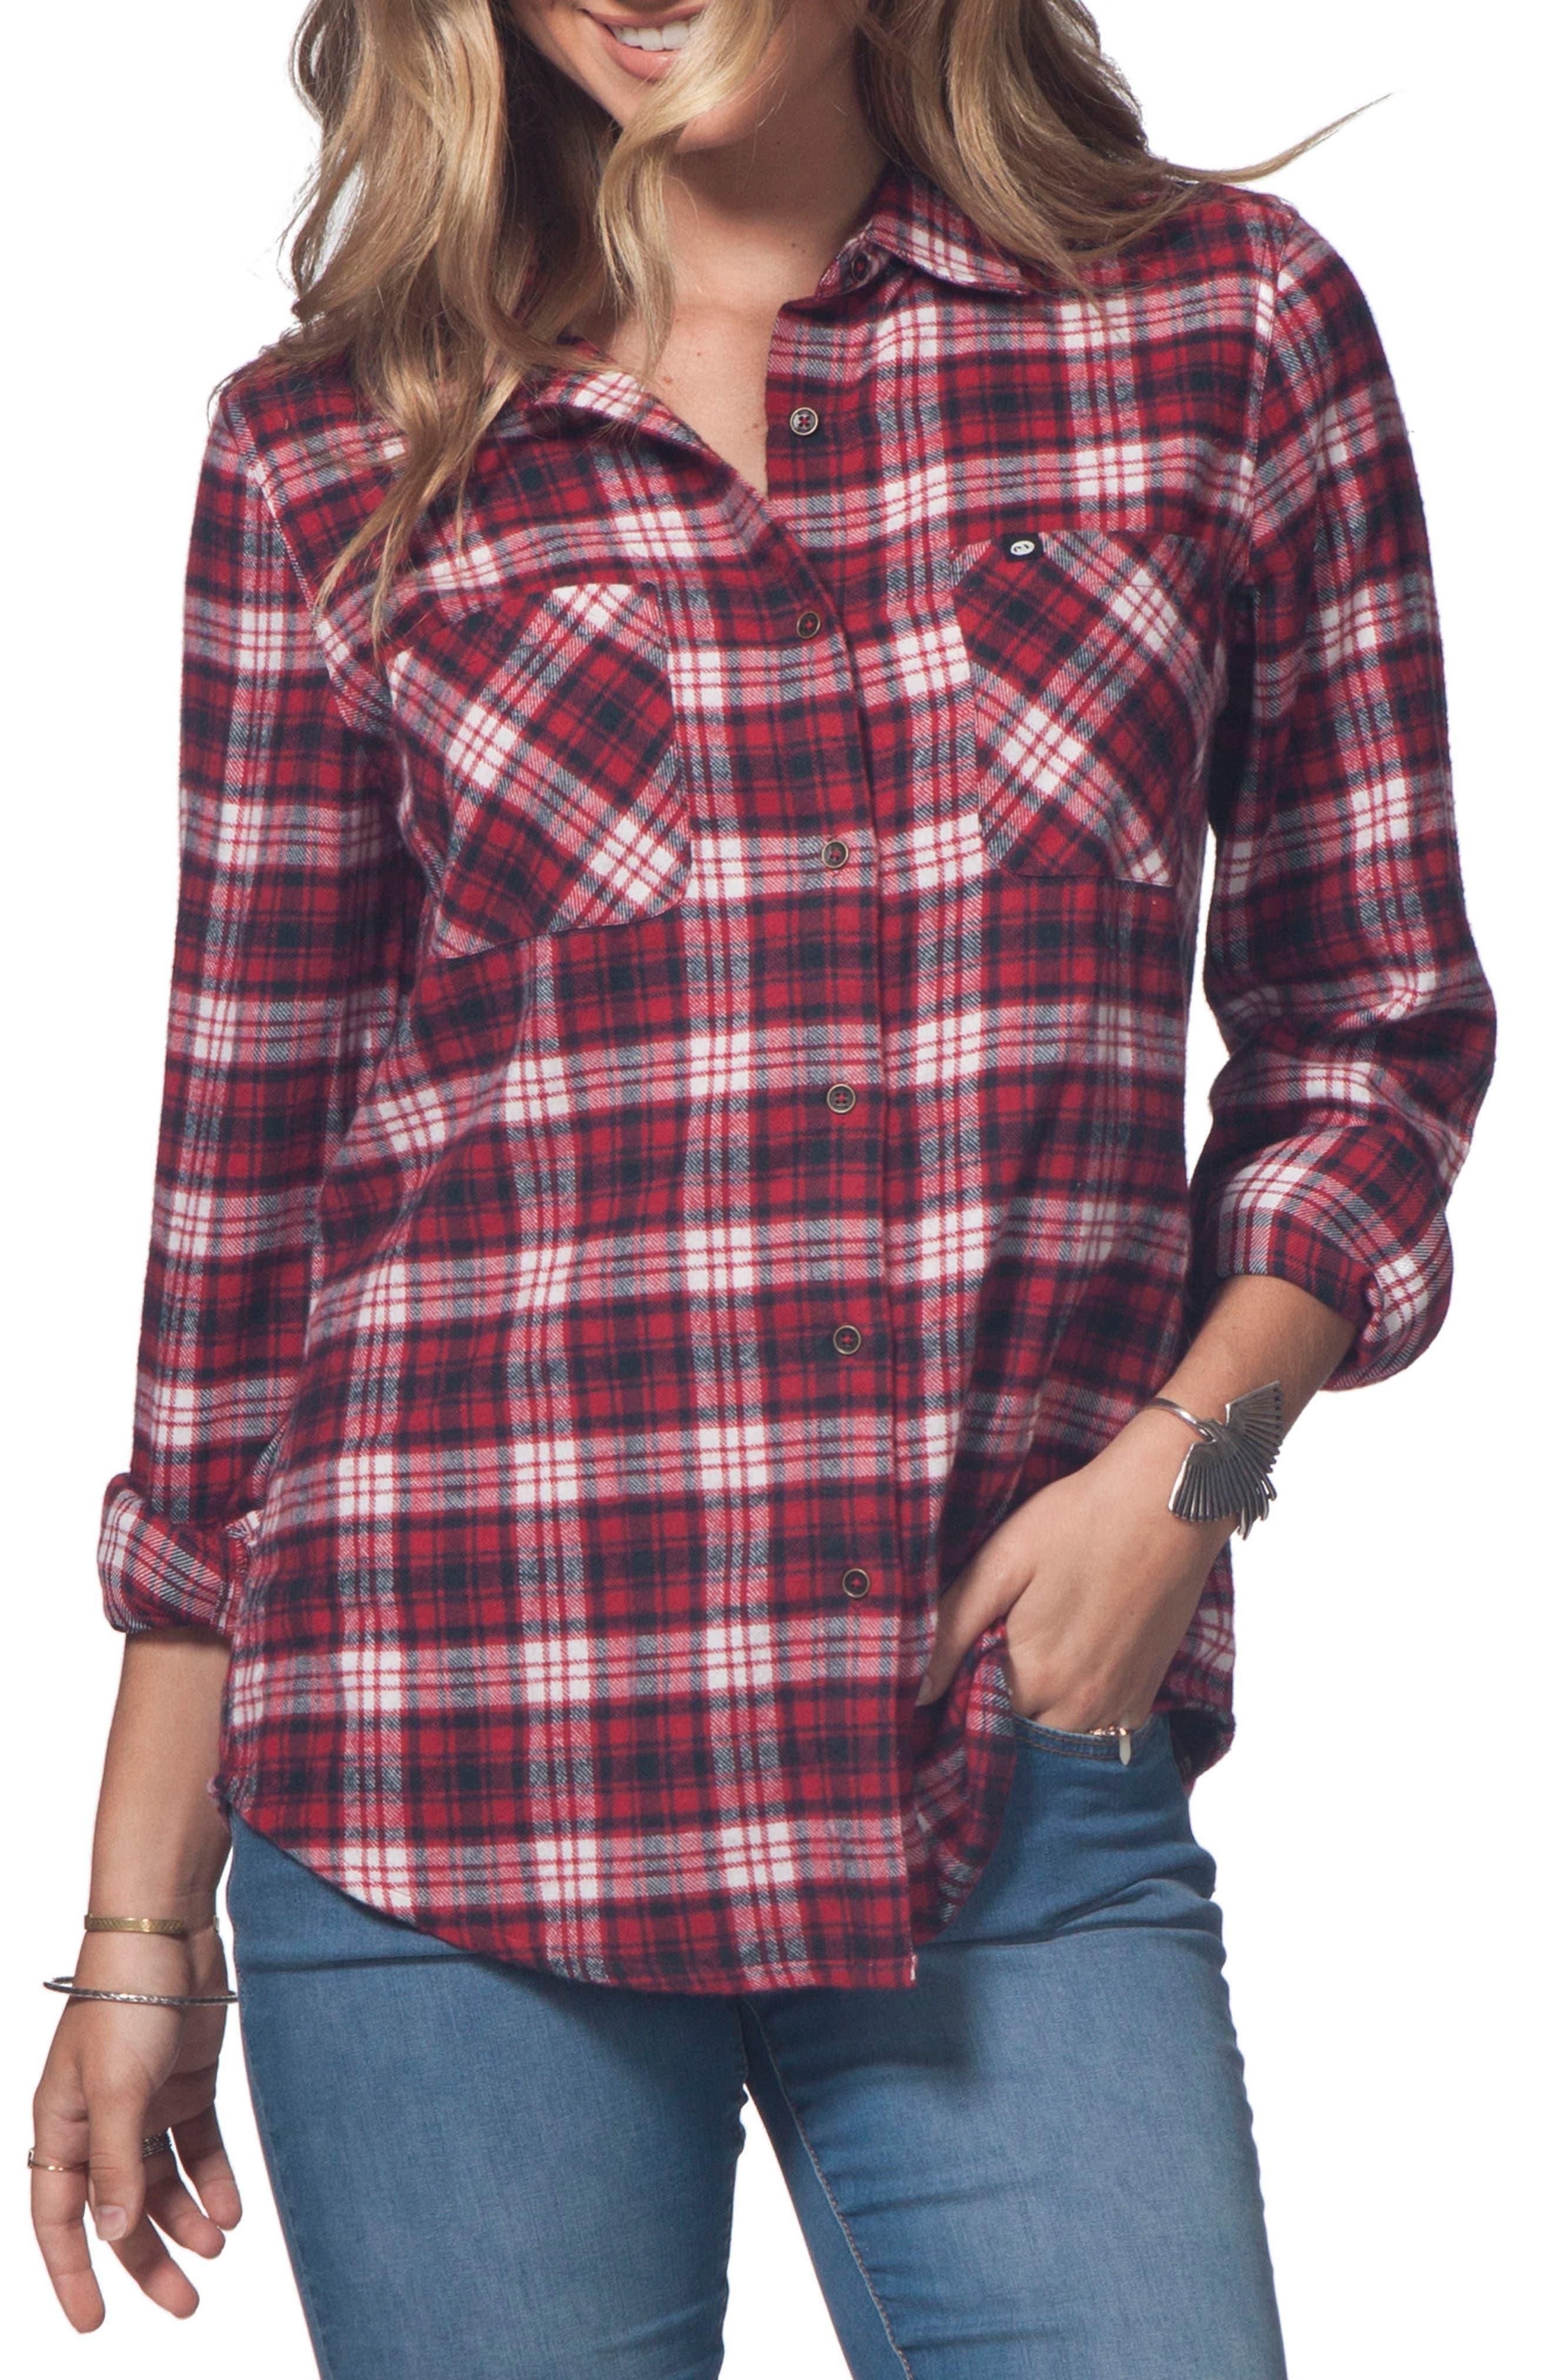 Main Image - Rip Curl Bonfire Flannel Top